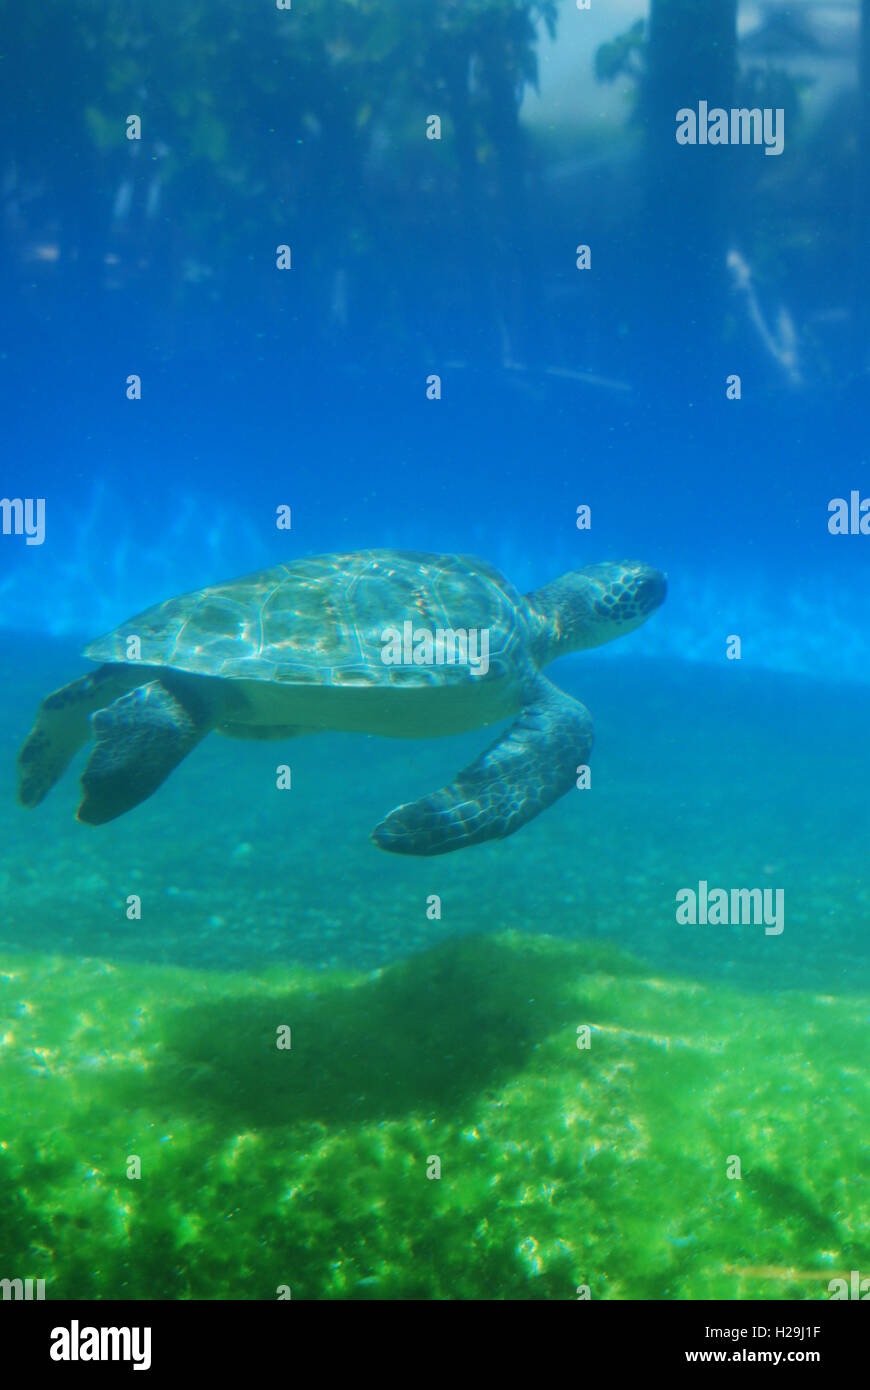 Sea turtle gliding along underwater. - Stock Image